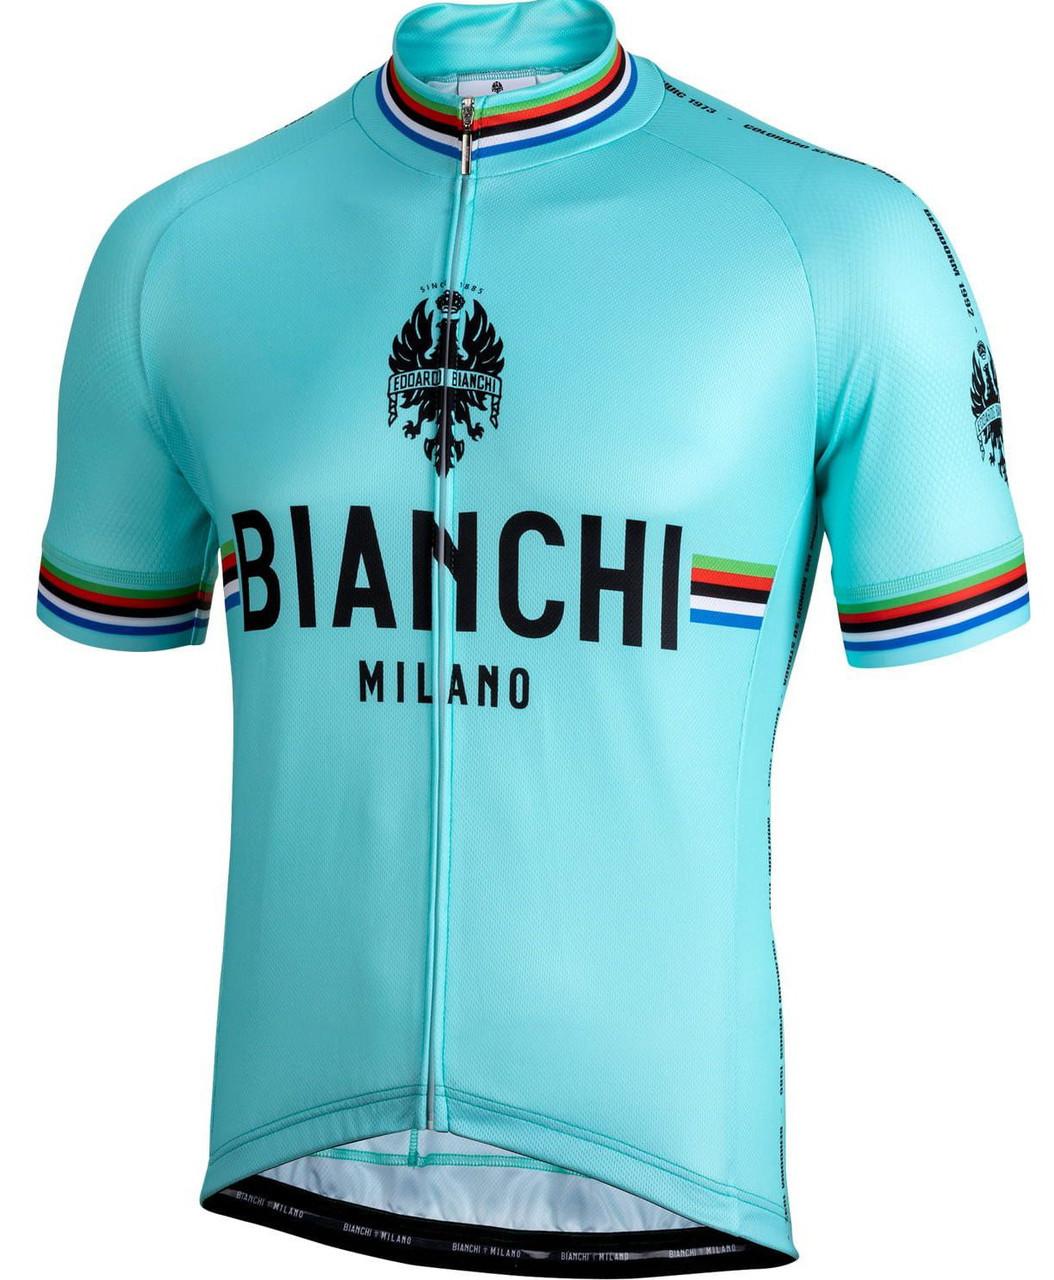 Bianchi Milano New Pride Green Jersey